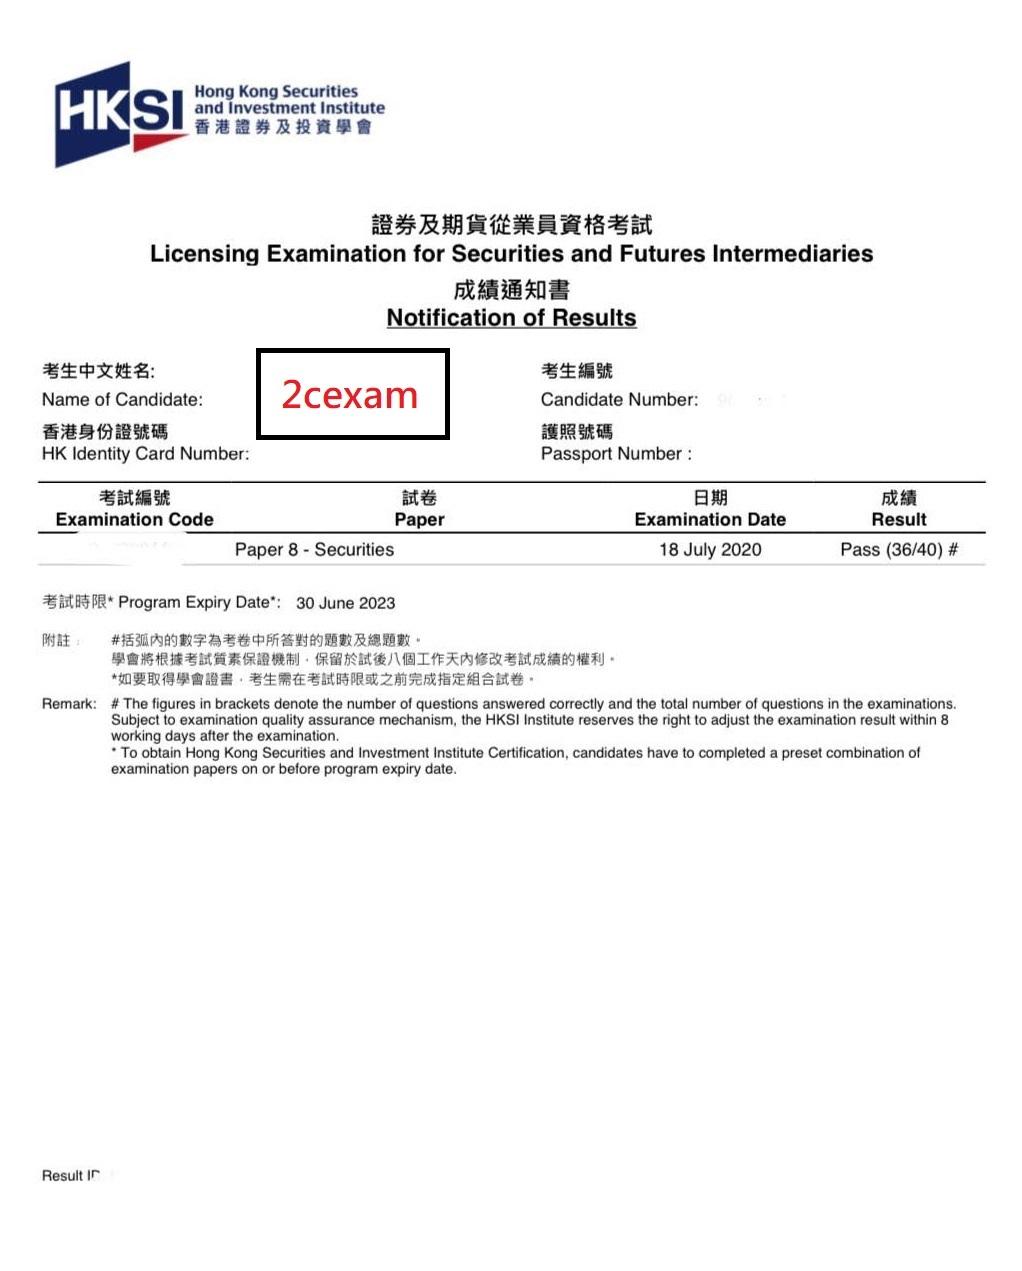 SYC 18/07/2020 LE Paper 8 證券期貨從業員資格考試卷八 Pass